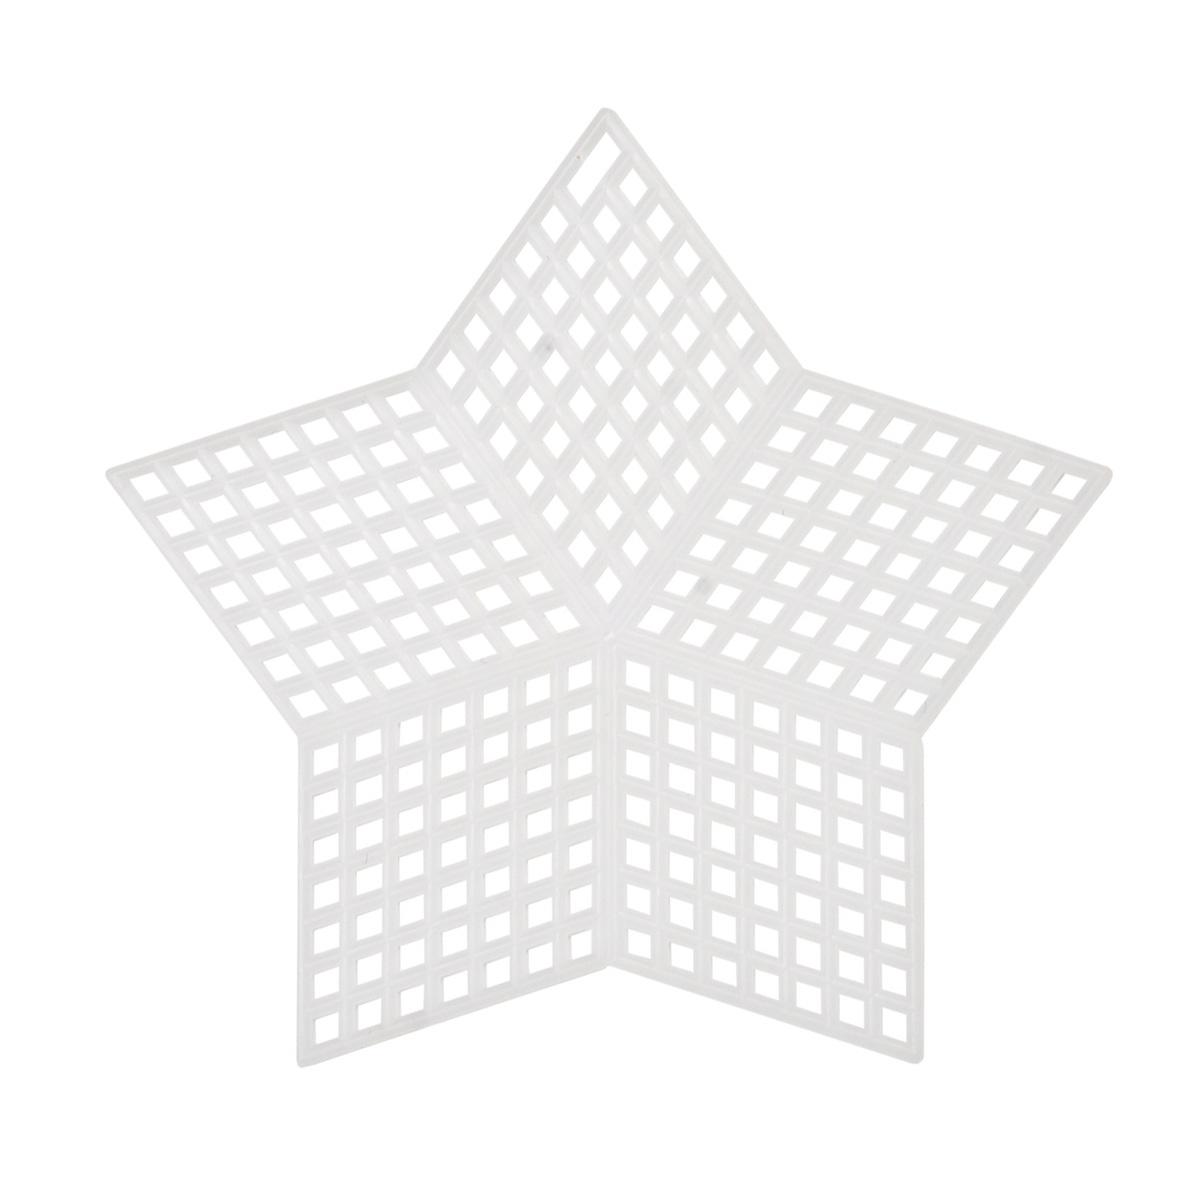 Канва пластиковая, мал. 'Звезда', 9*9 см, Bestex